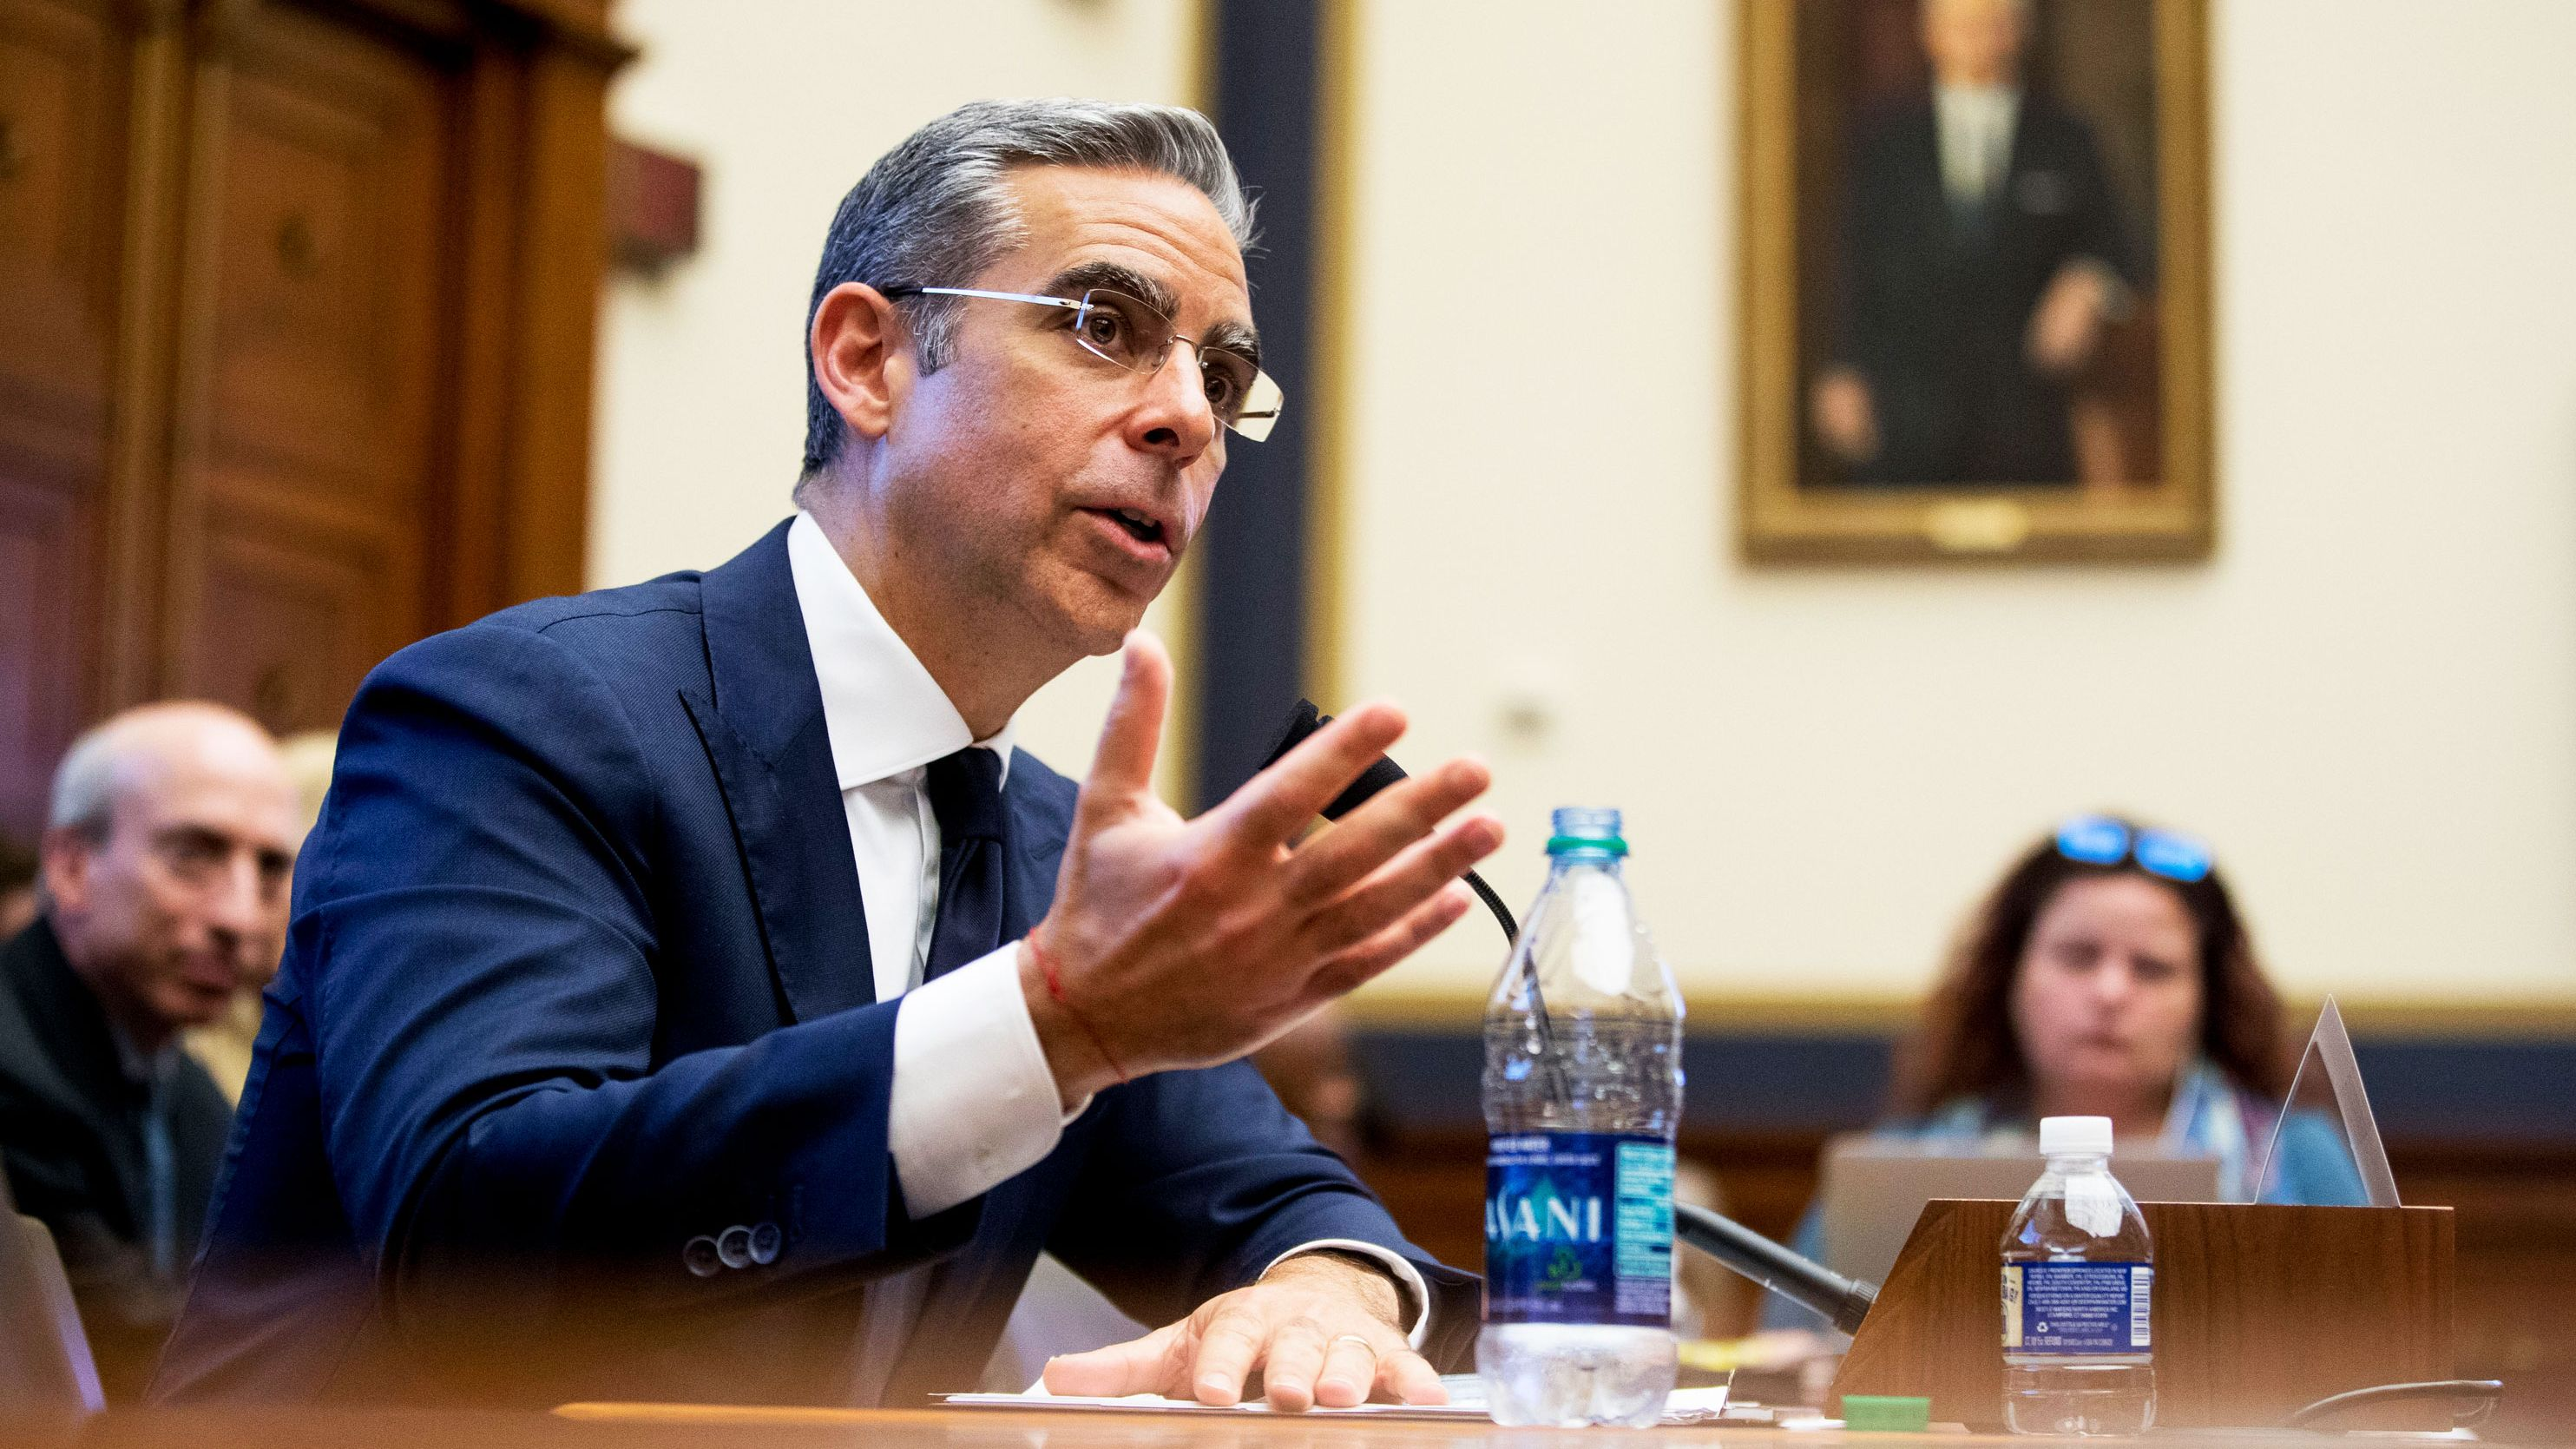 「FB銀行」は認めない、 米議会がリブラ責任者を追及